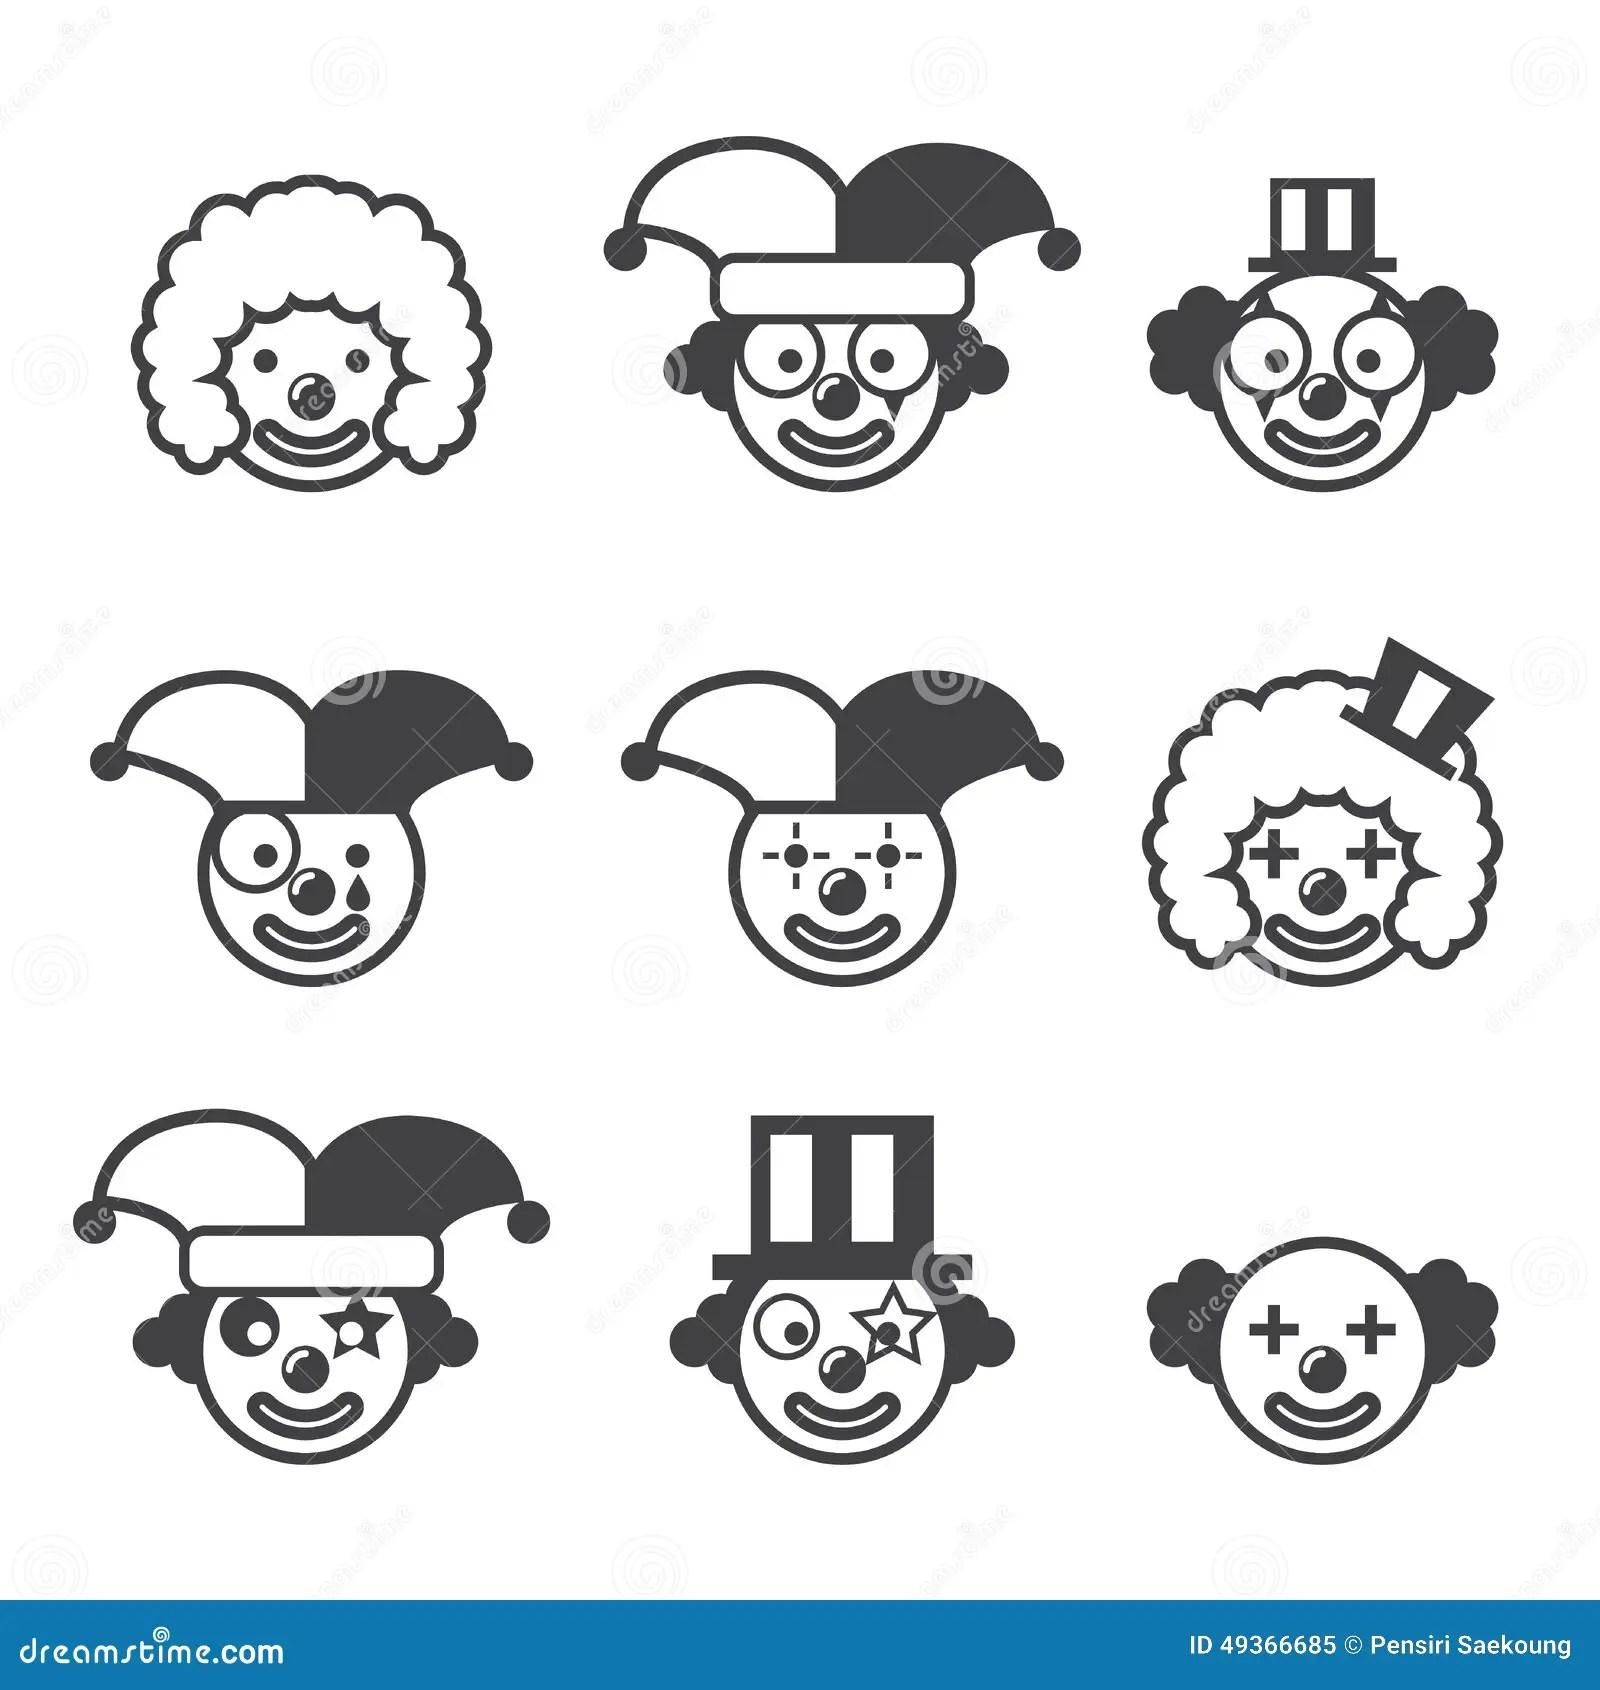 Joker Icon Stock Vector Illustration Of Business